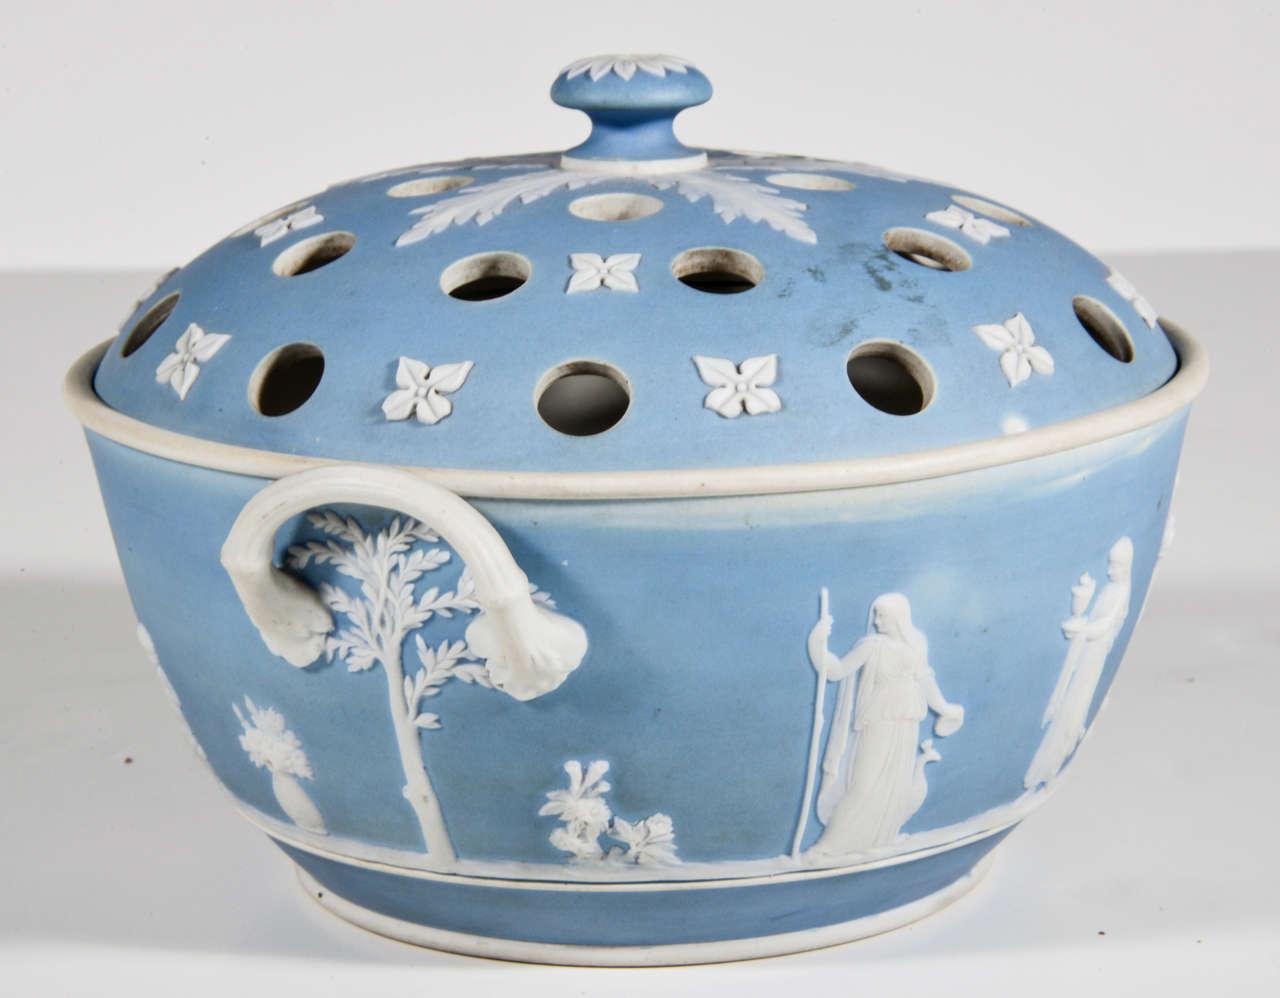 20th Century English Wedgwood Blue-dip Jasperware Stoneware Covered Potpourri Bowl For Sale